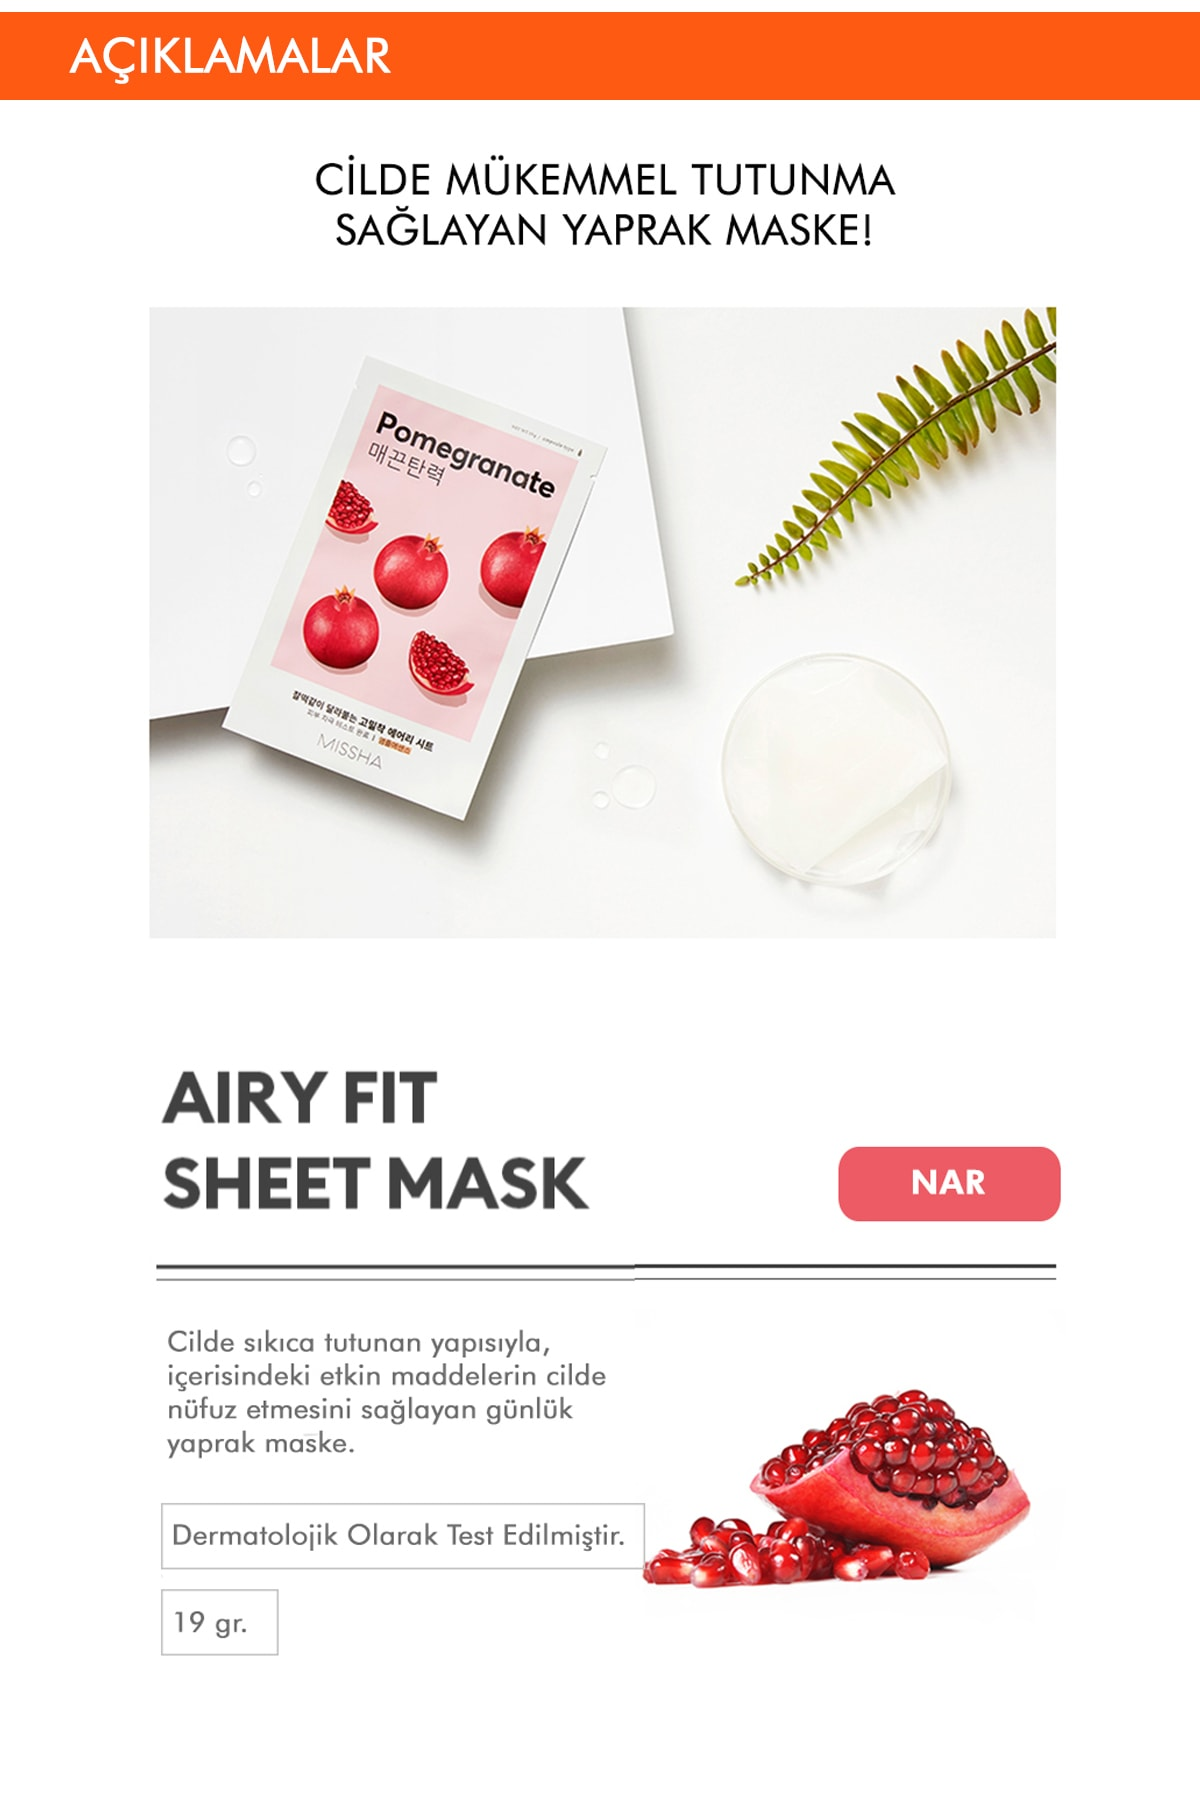 Missha Yaşlanma Karşıtı Nar Özlü Sıkılaştırıcı Yaprak Maske (1ad) Airy Fit Sheet Mask Pomegranate 1